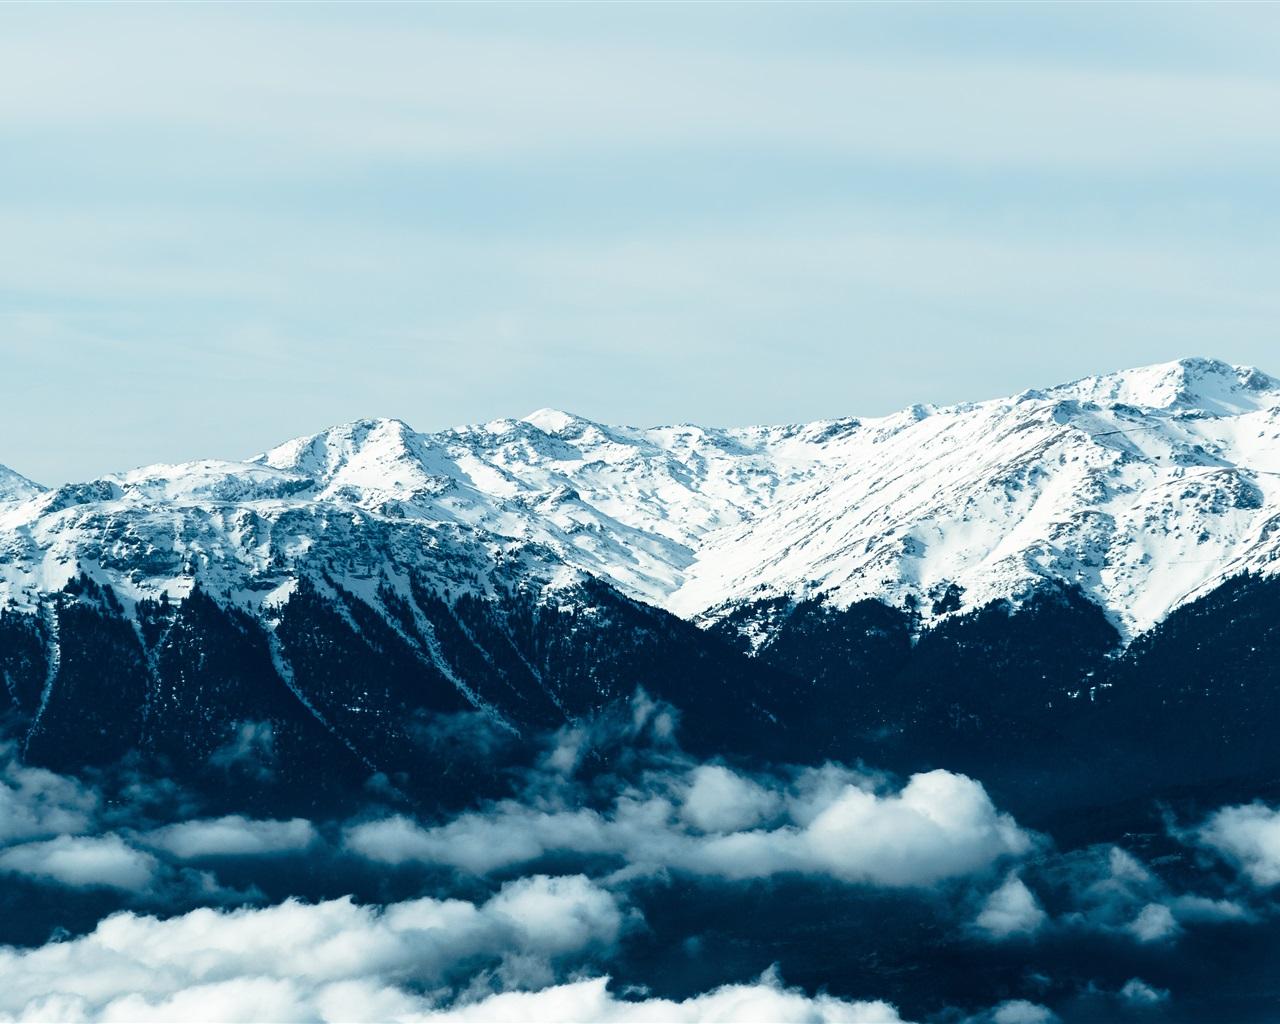 Fondo Escritorio Picos Montañas Nevadas: Fondos De Pantalla Montañas, Nieve, Picos, Niebla